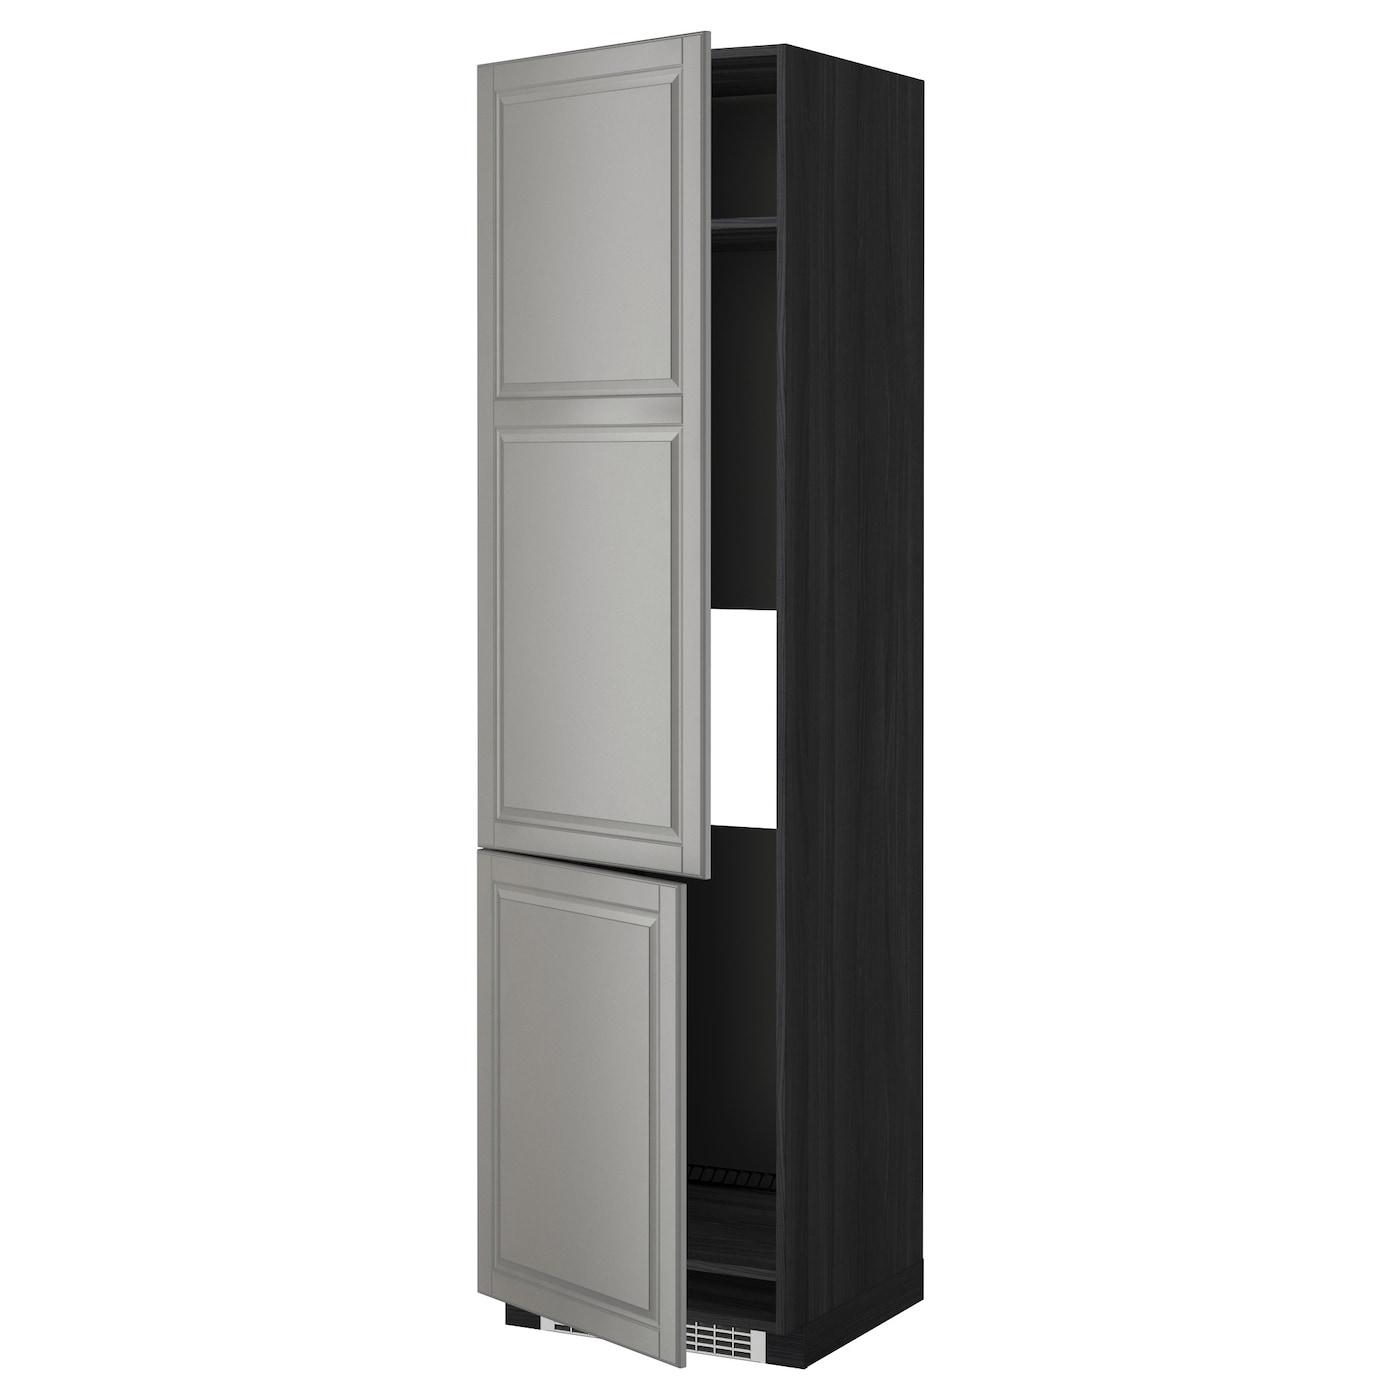 Metod high cab f fridge freezer w 2 doors black bodbyn - Mobile frigo incasso ...